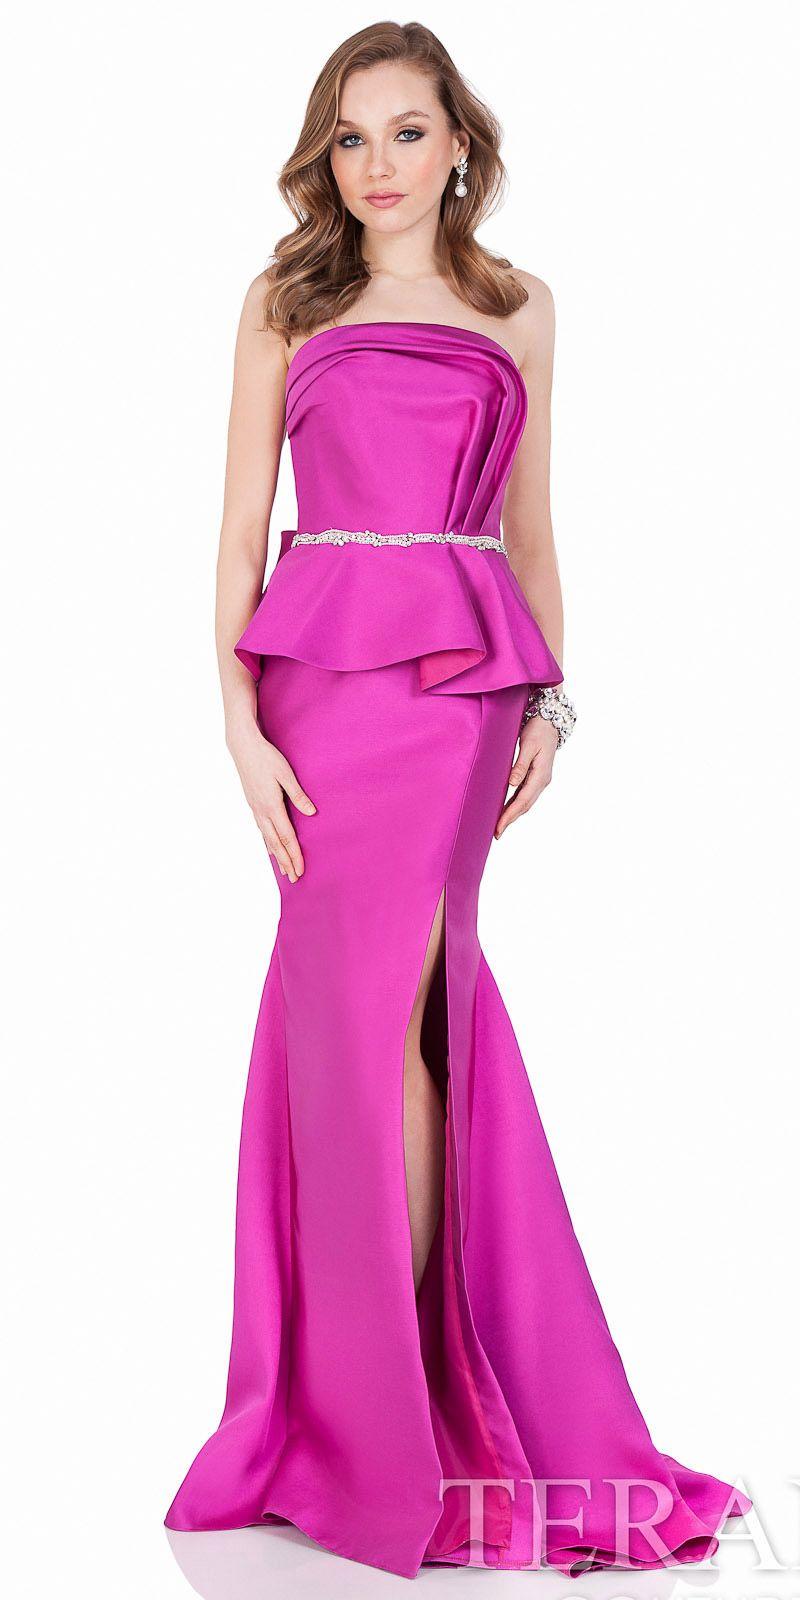 Strapless Draped Peplum Gown by Terani Couture #edressme | TERANI ...